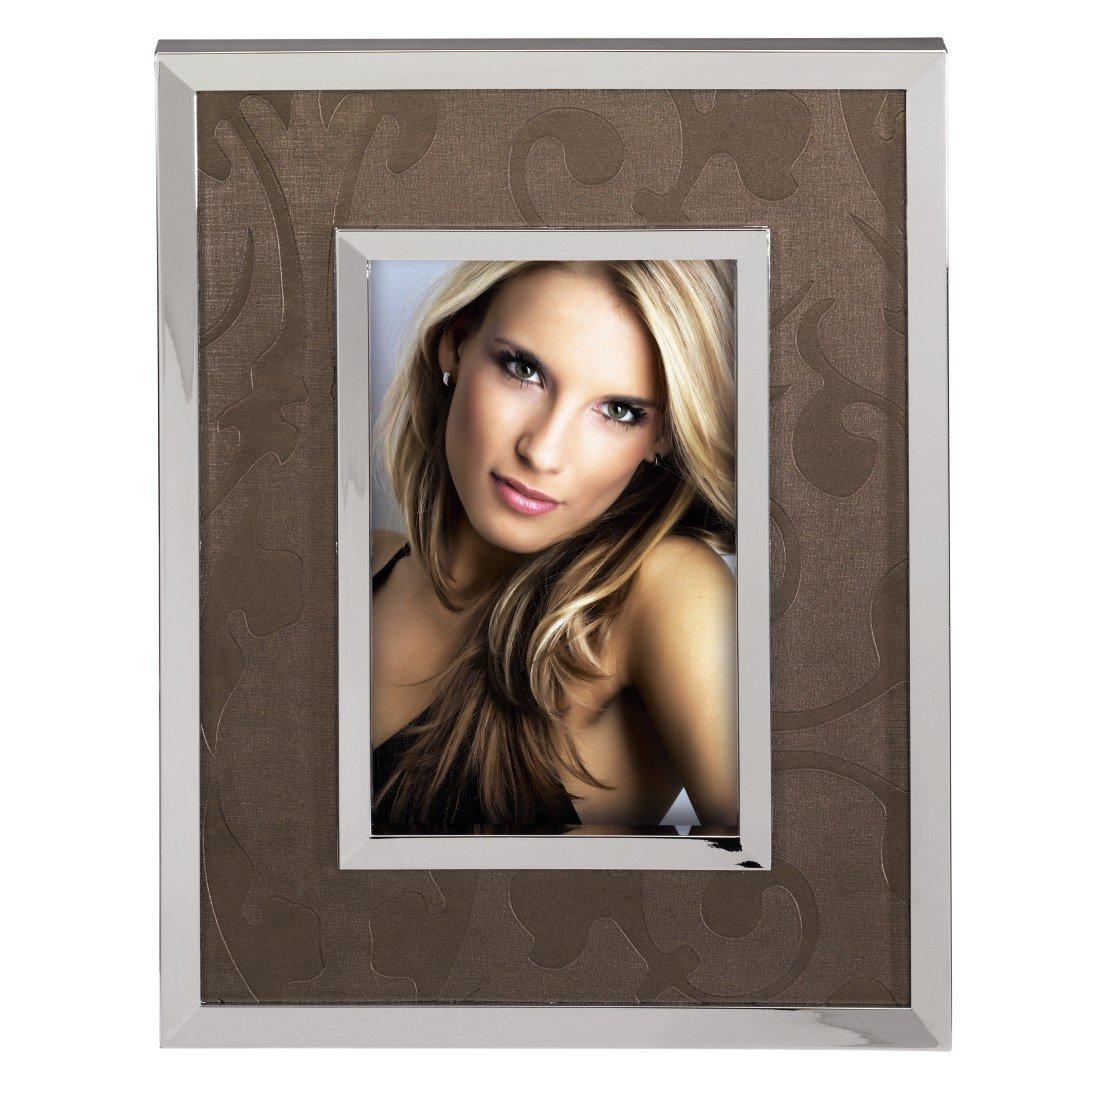 Argento Cornice per foto singola 10 x 15 cm Marrone Hama Lyon